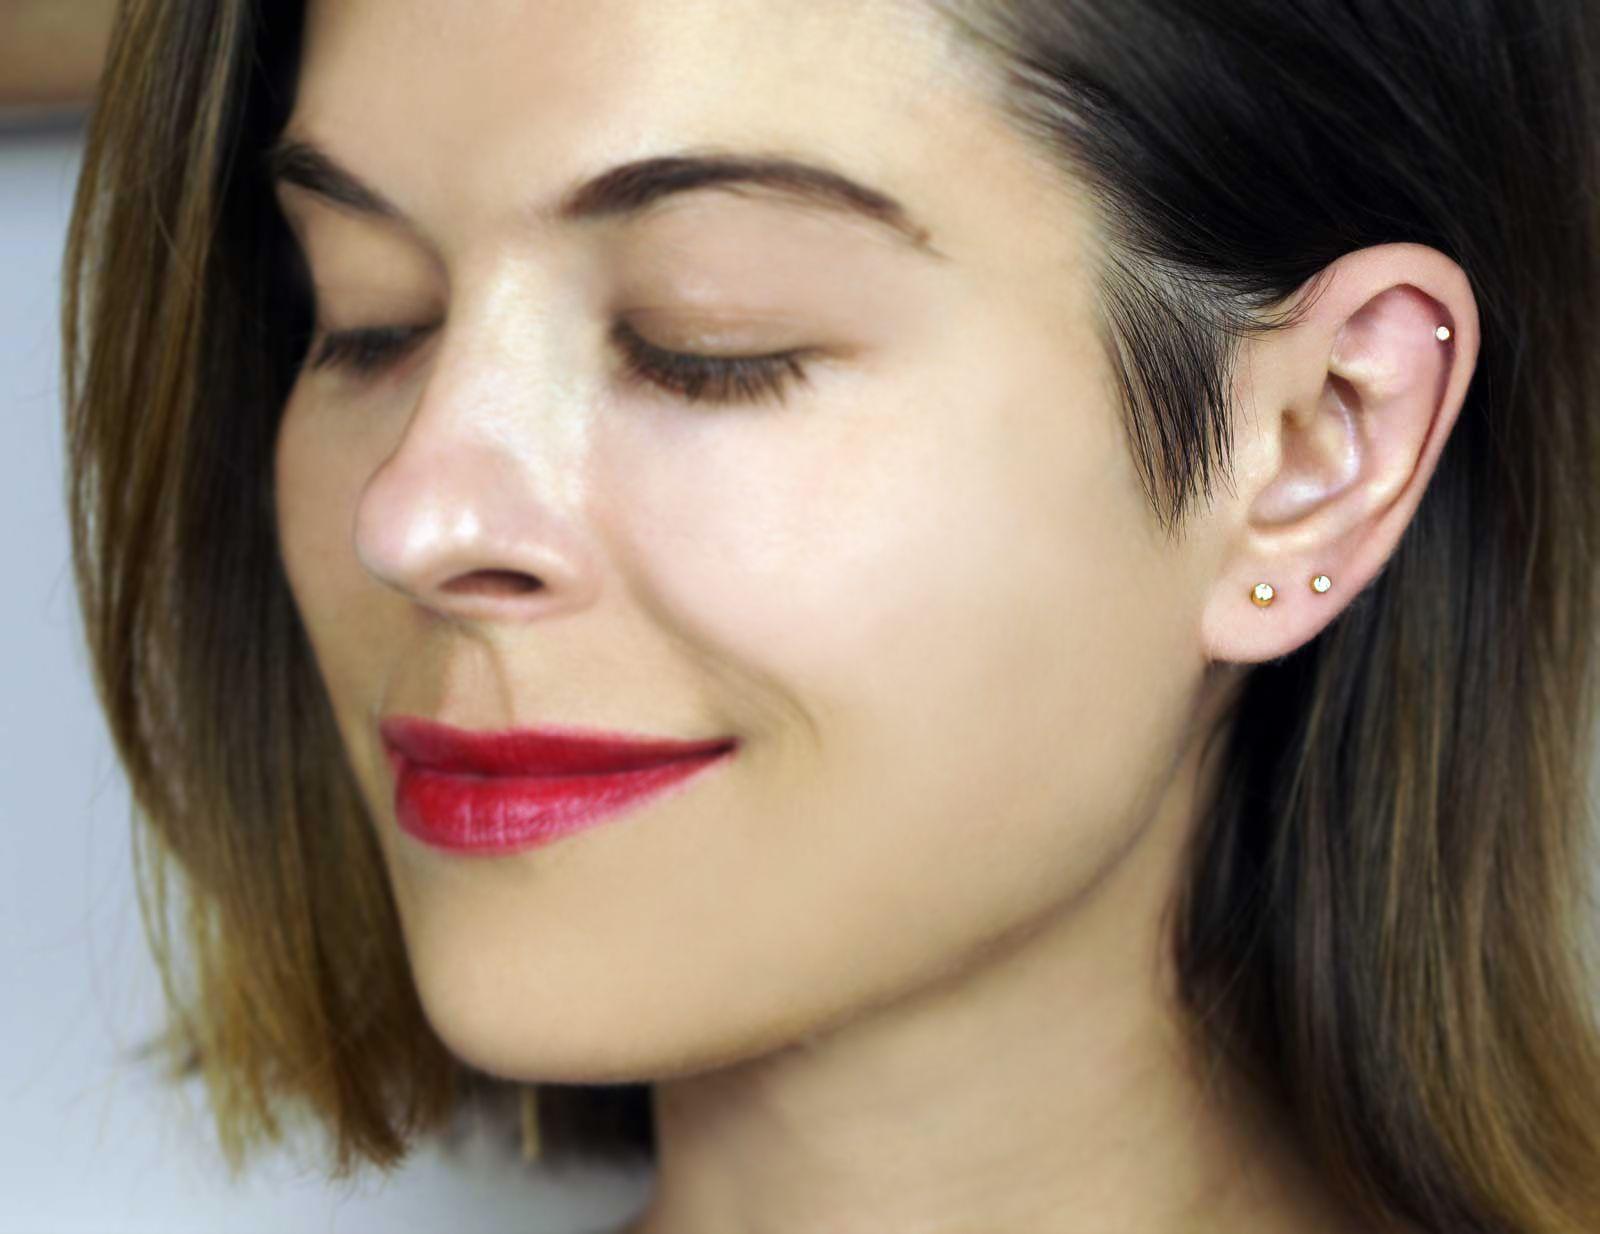 46b5b2465 Small Single Diamond 18K Yellow Gold Cartilage Helix Piercing Stud Earring  | LENA COHEN